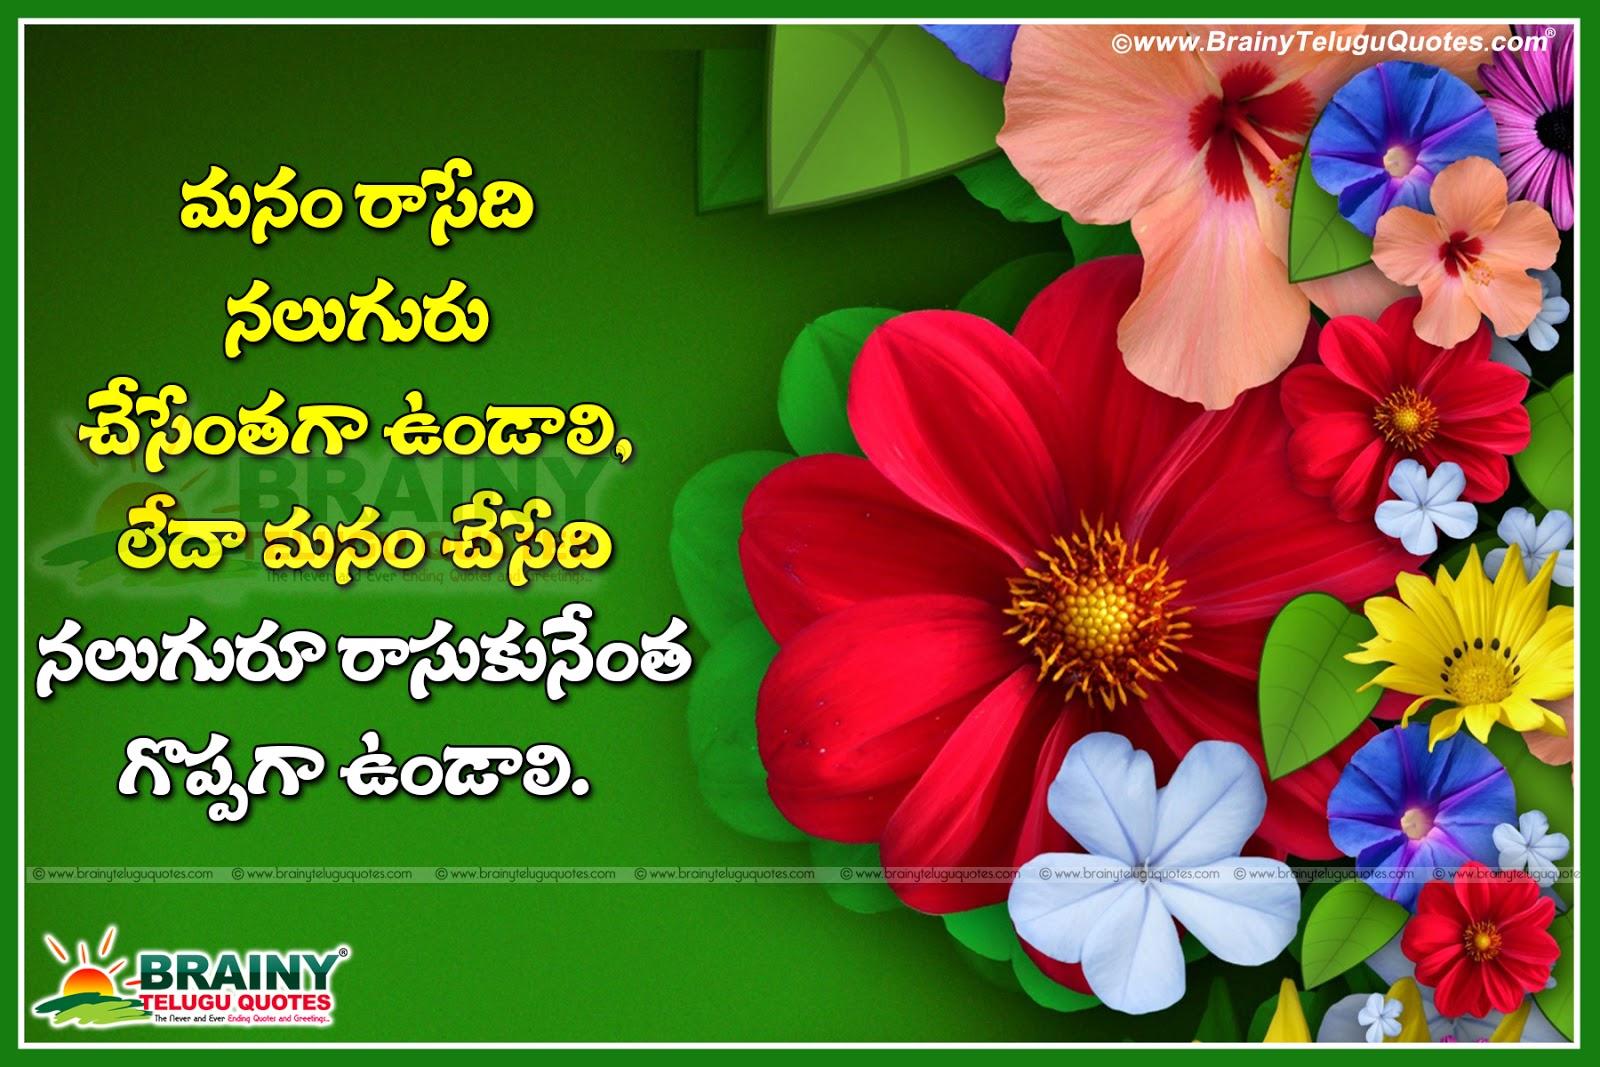 Powerful Telugu Quotes On Life In Telugu Language Schools Swami